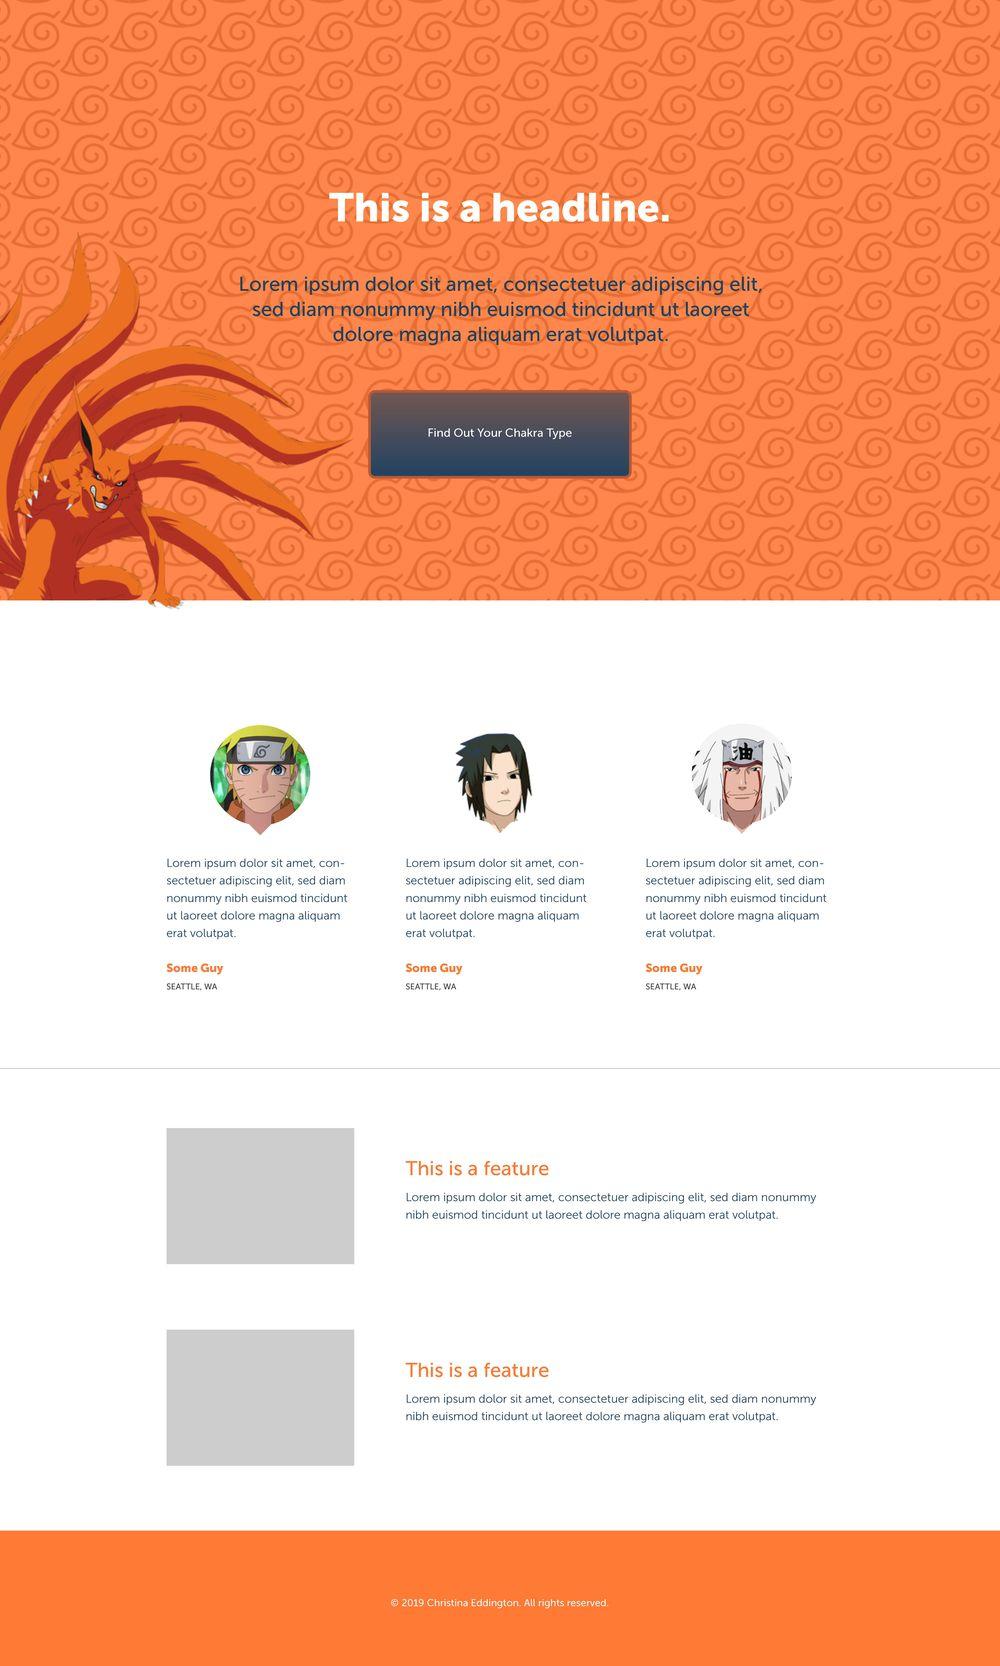 NarutoLand - image 1 - student project